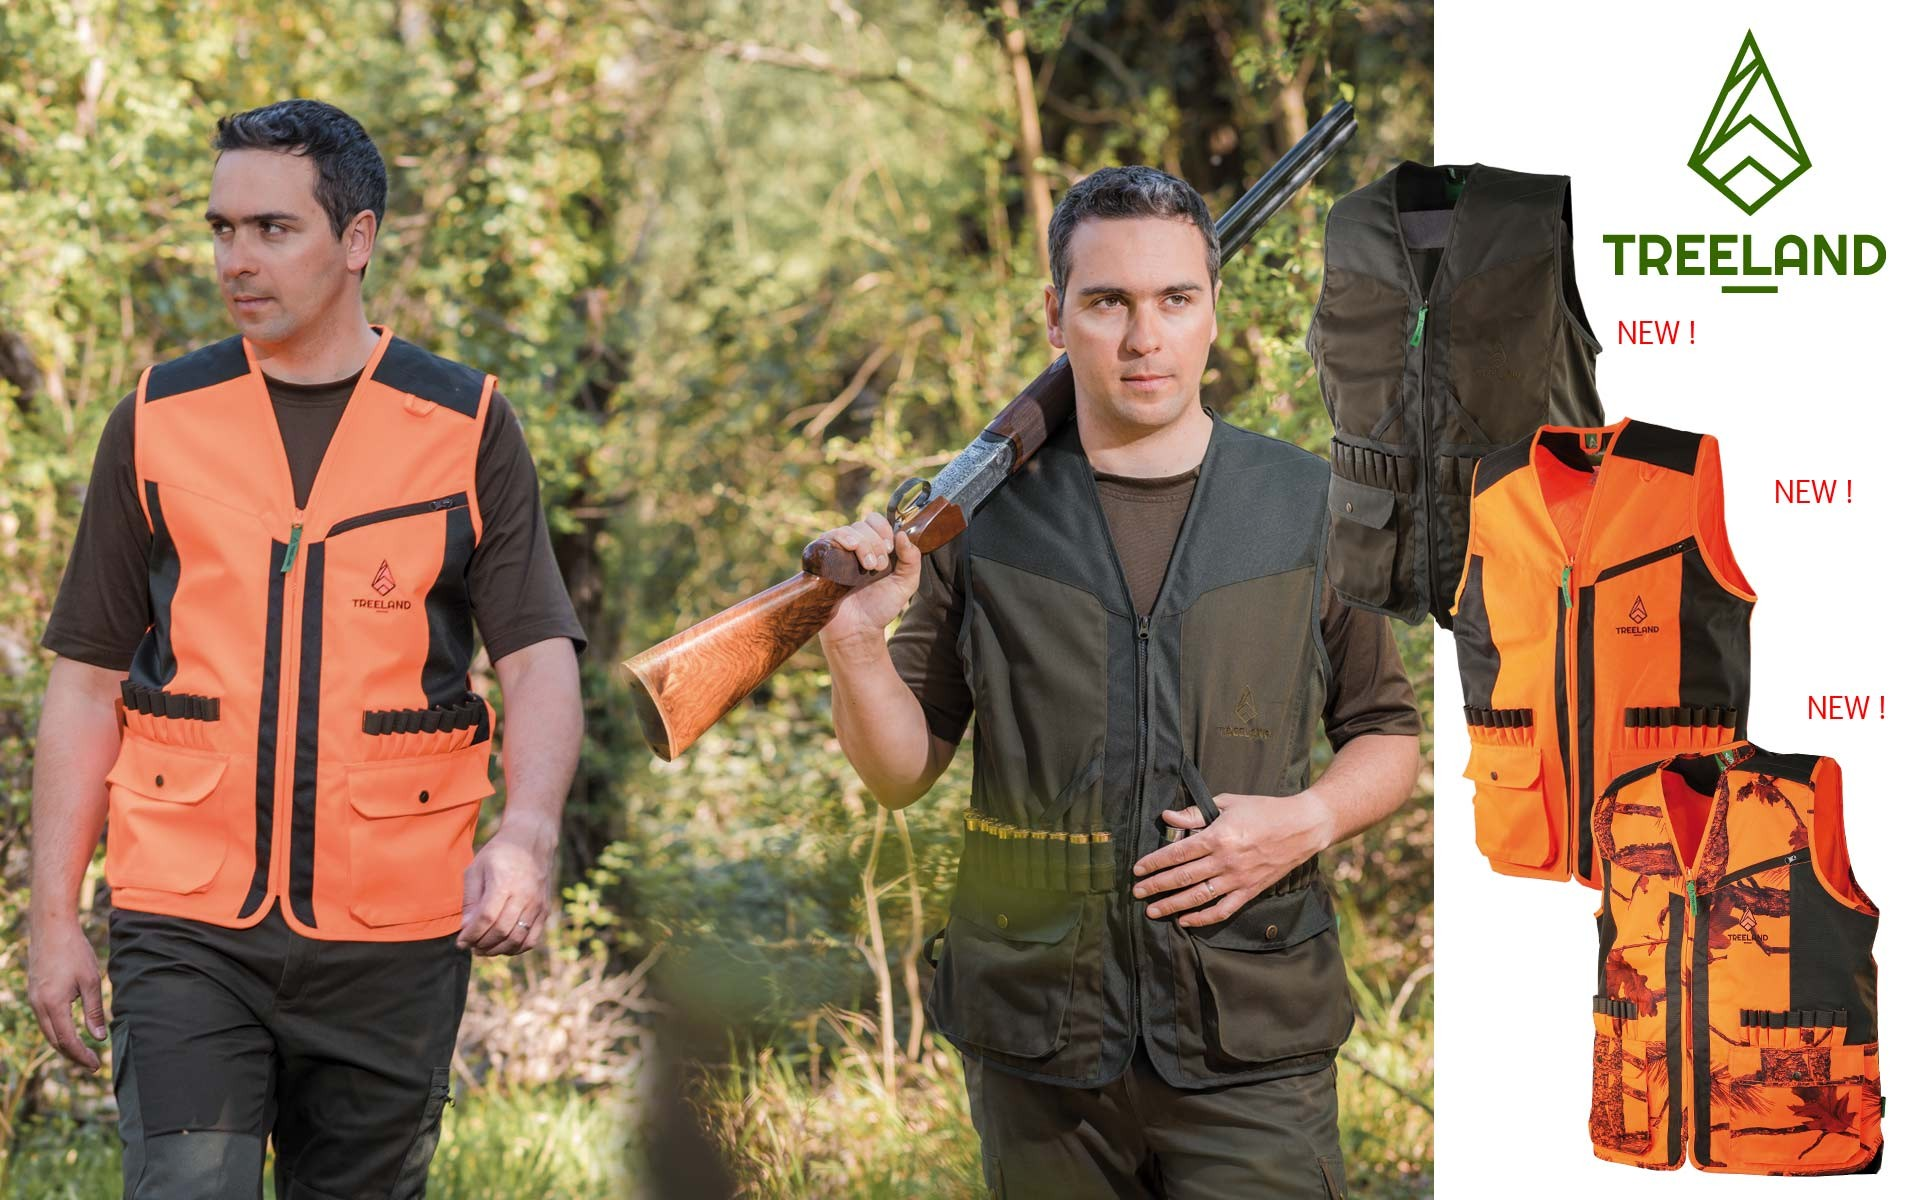 Treeland vests